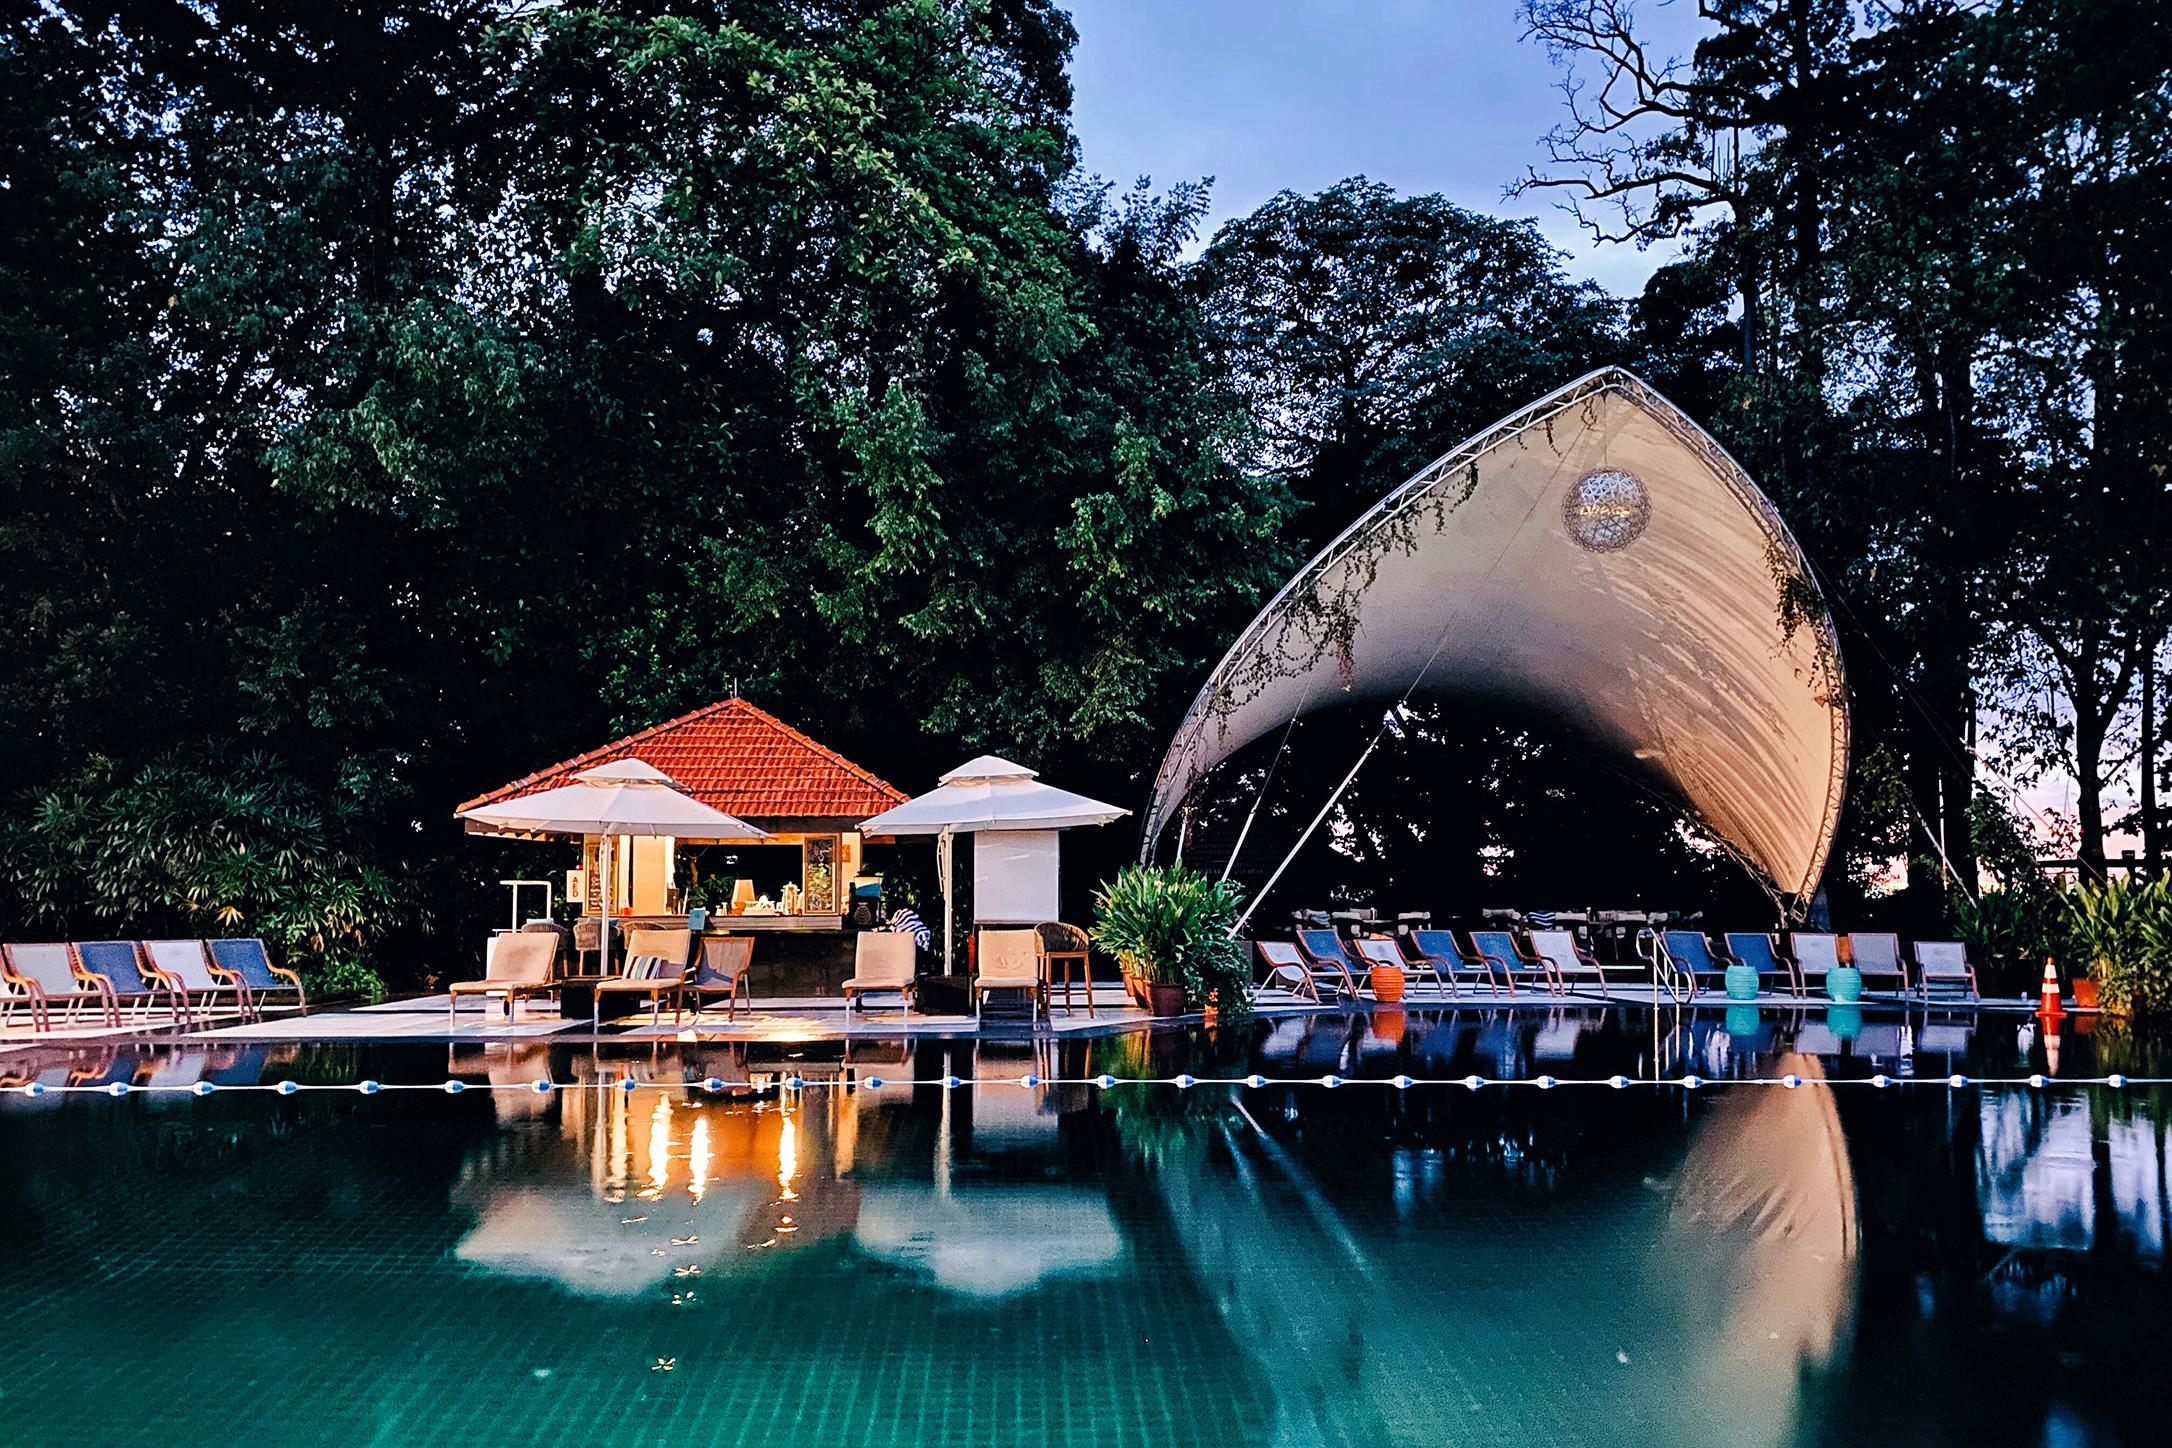 sentosa, luxury lifestyle awards, singapore, sofitel, folioyvr, ecoluxluv, helen siwak, luxury lifestyle